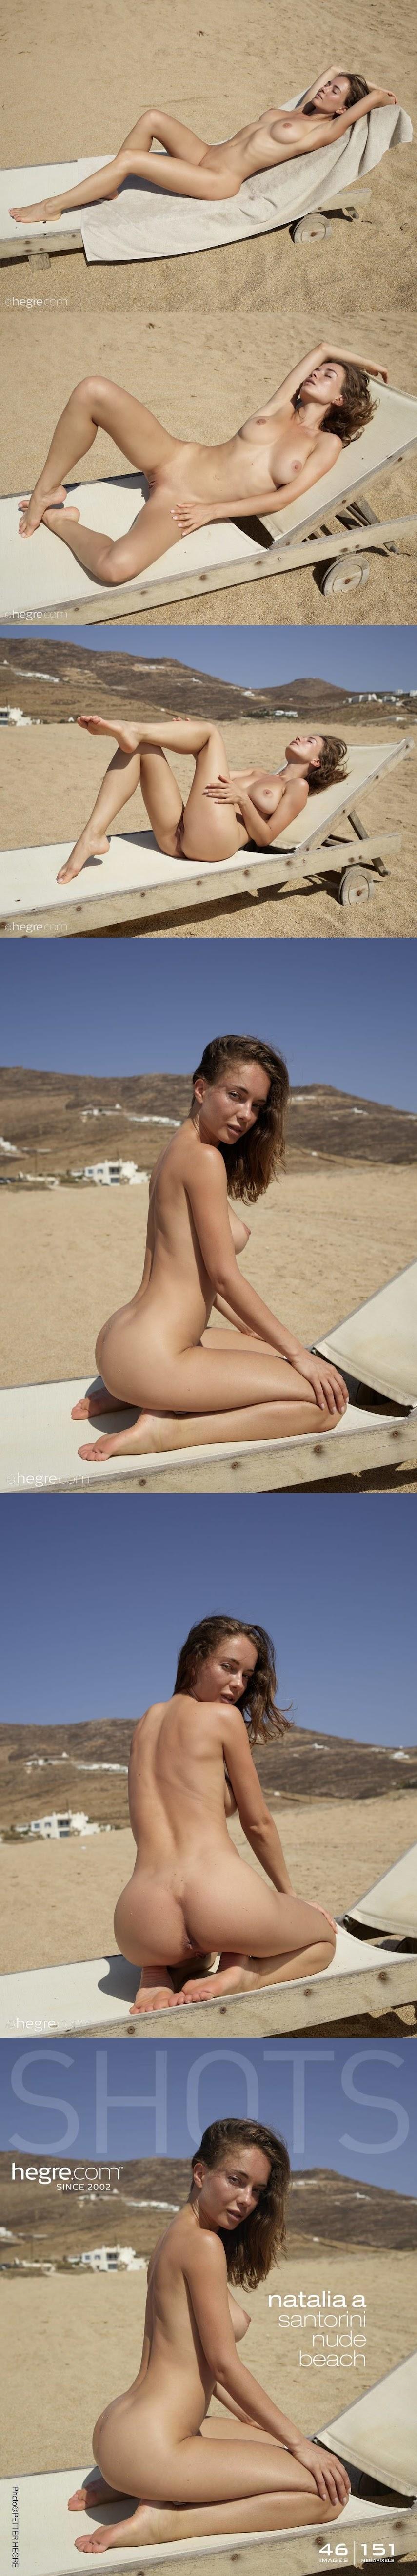 [Art] Natalia A - Santorini Nude Beach sexy girls image jav